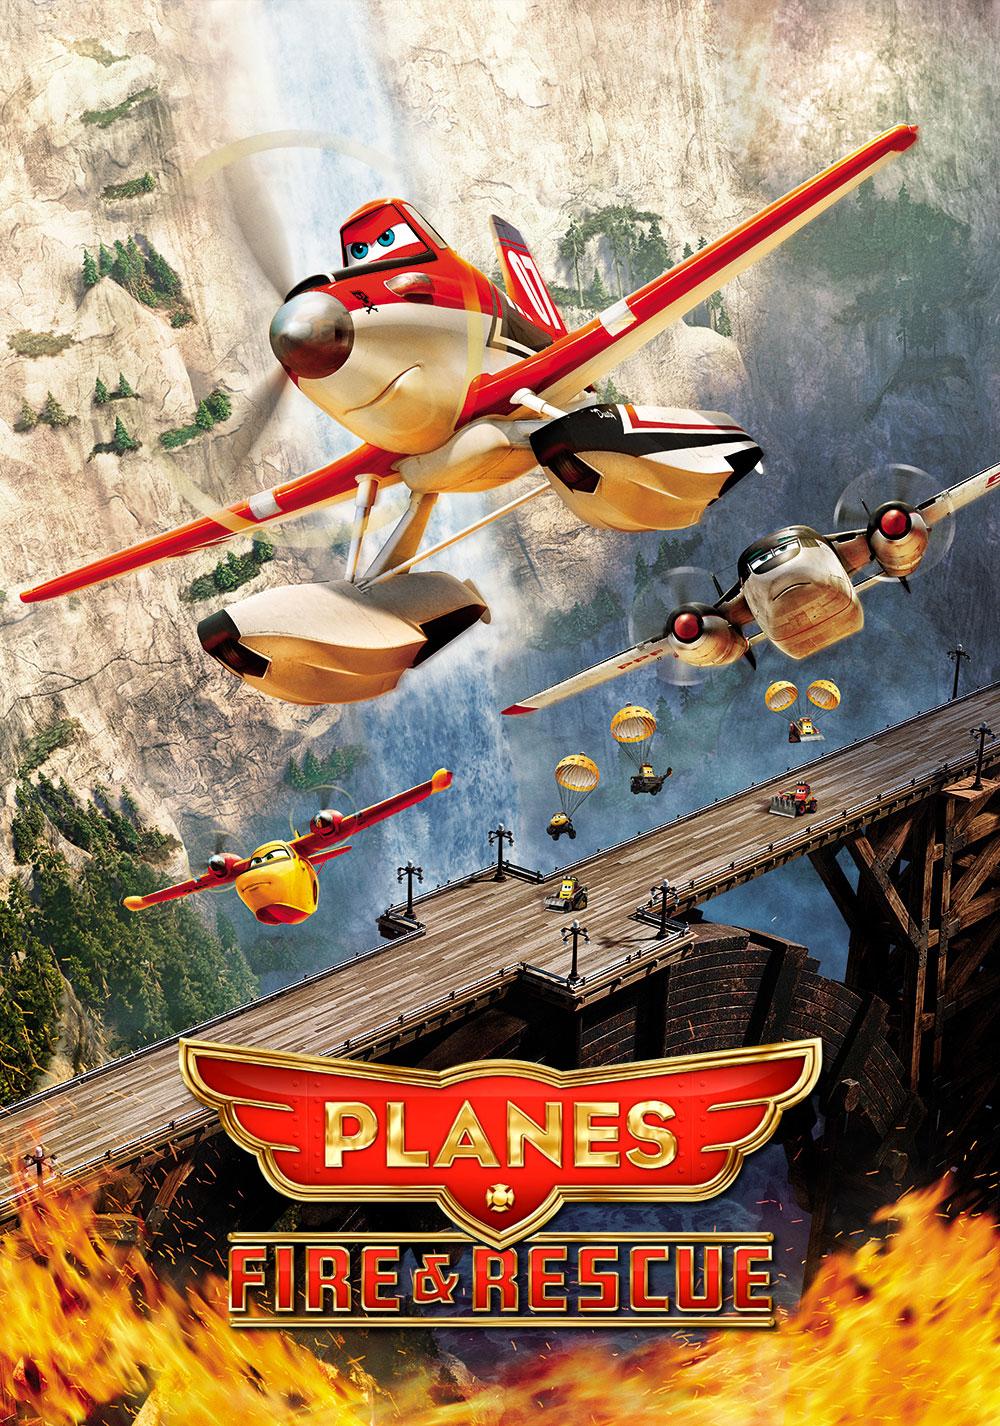 Planes fire rescue movie fanart fanart planes fire rescue movie poster image voltagebd Choice Image